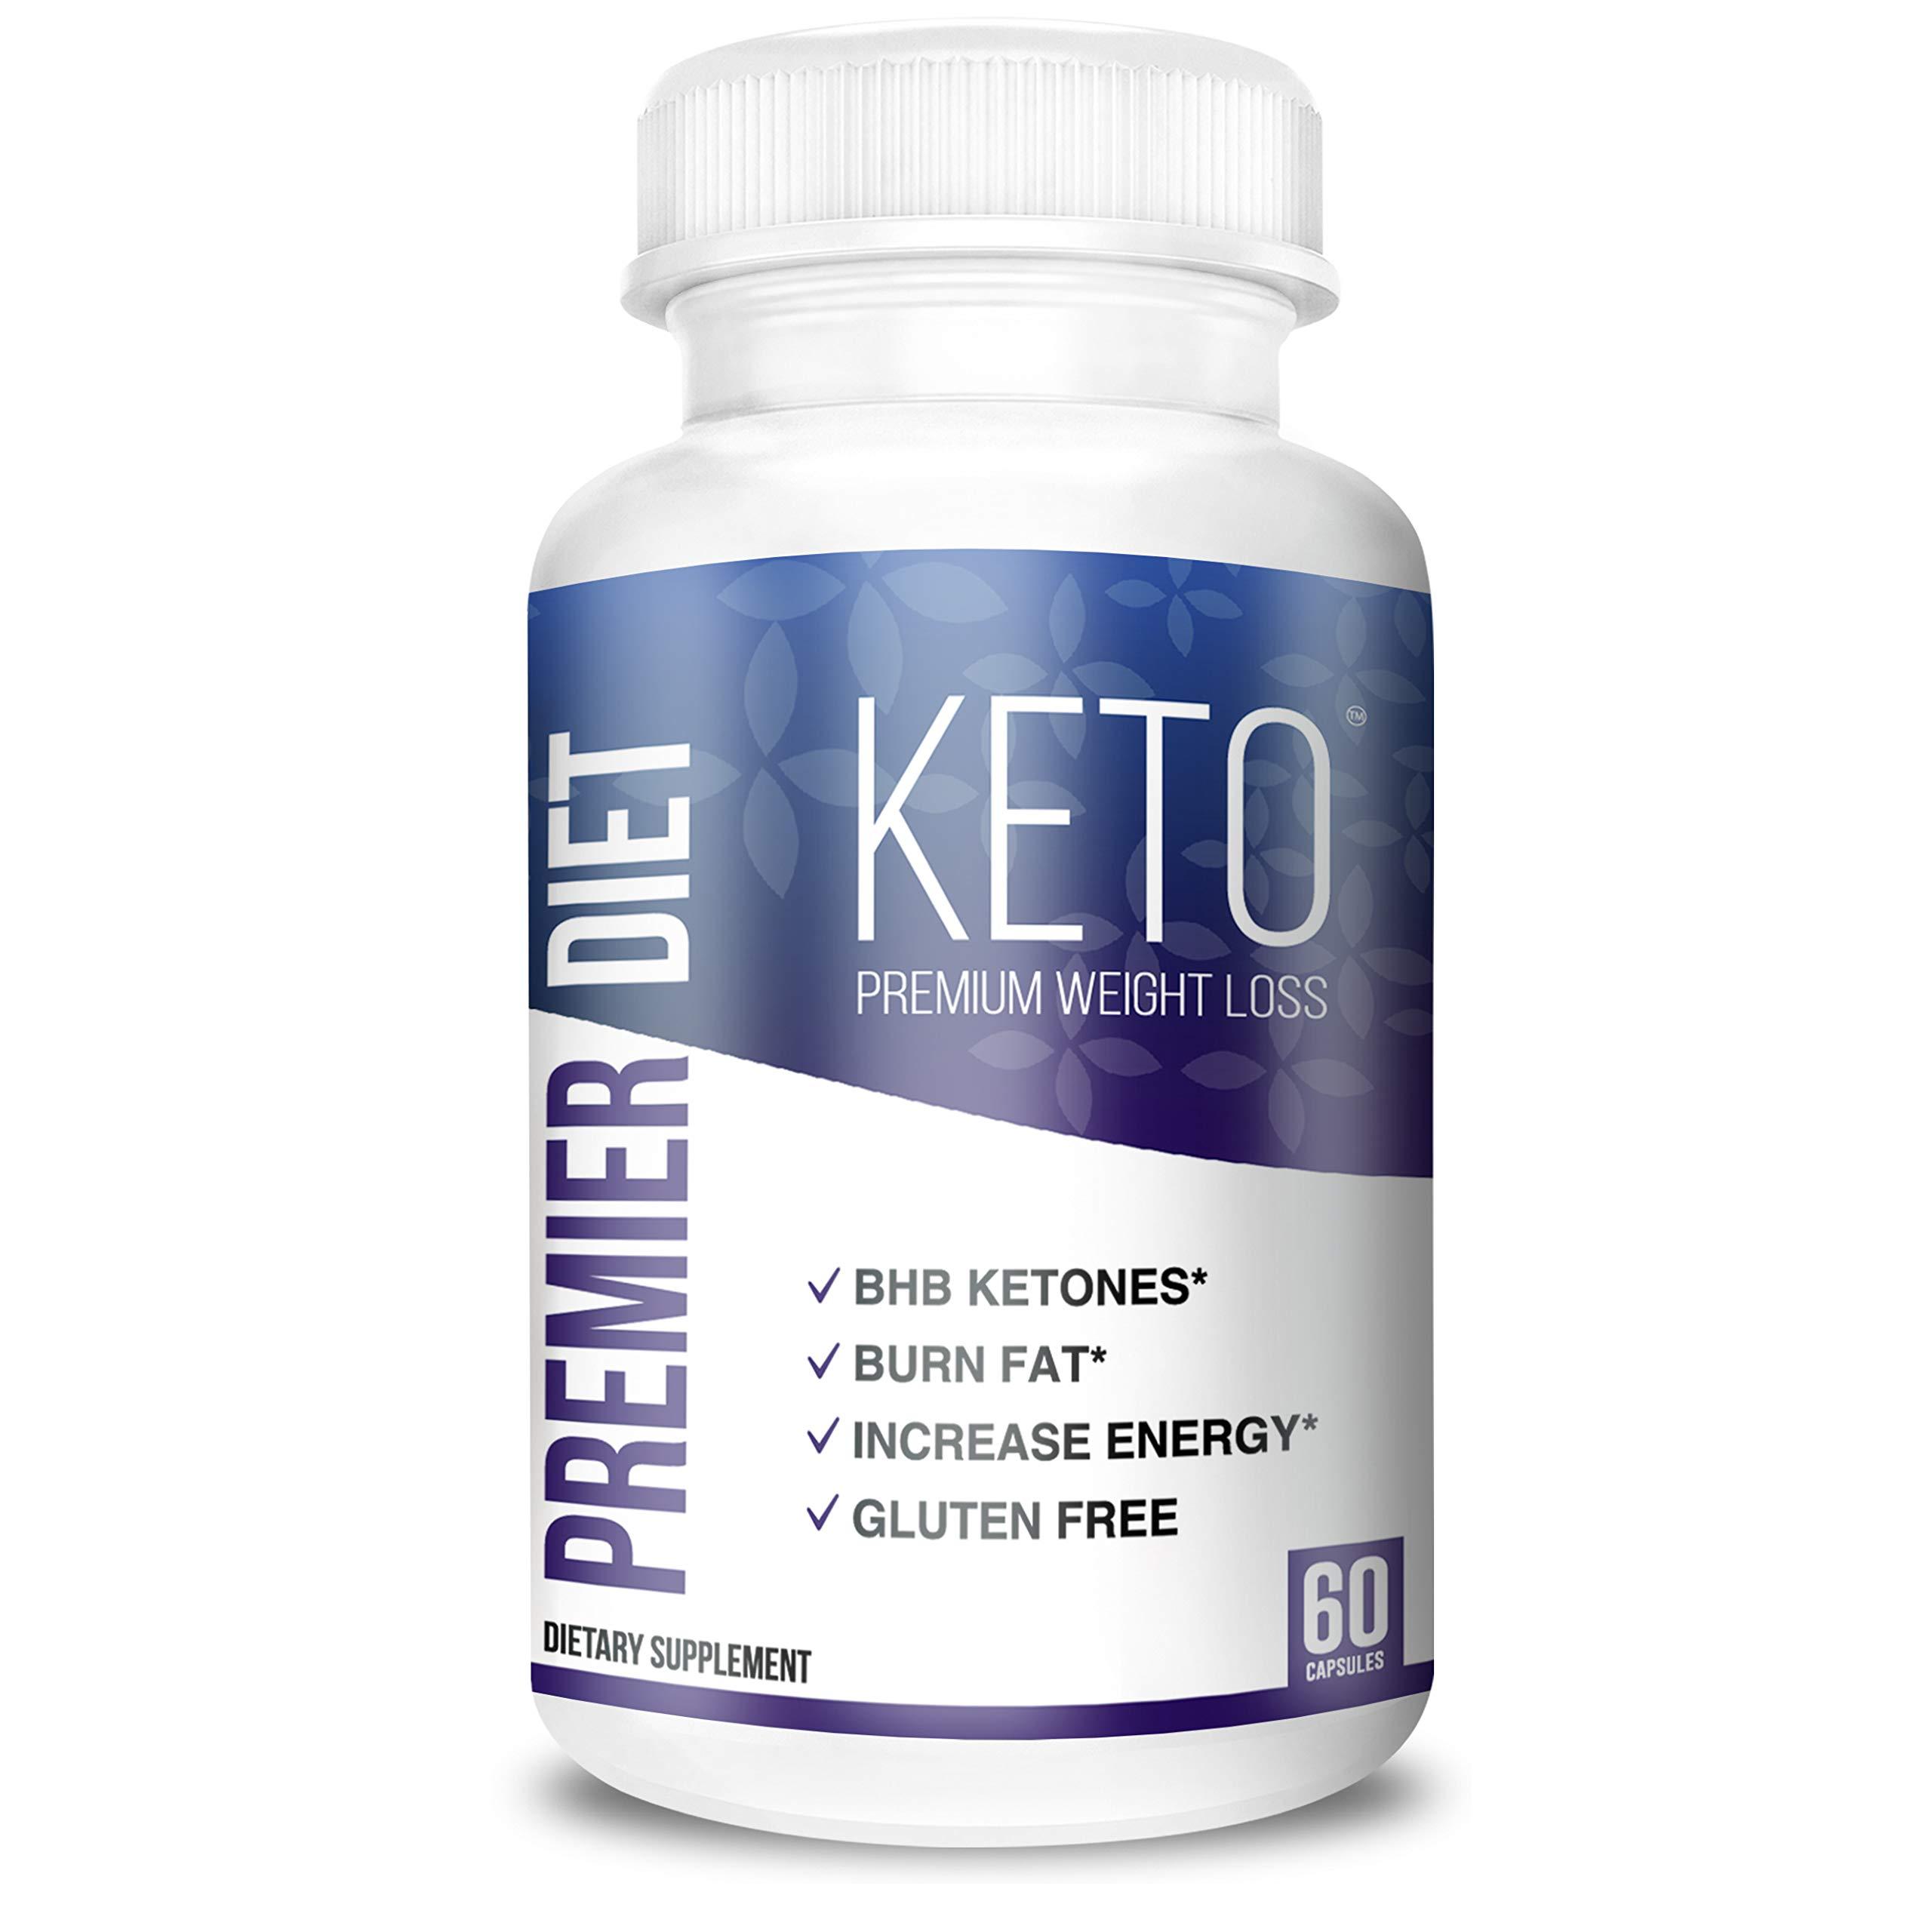 Amazon.com: Keto Burn - All Natural Keto Diet Pills - Ketogenic Fat Burner, Vegan Friendly ...